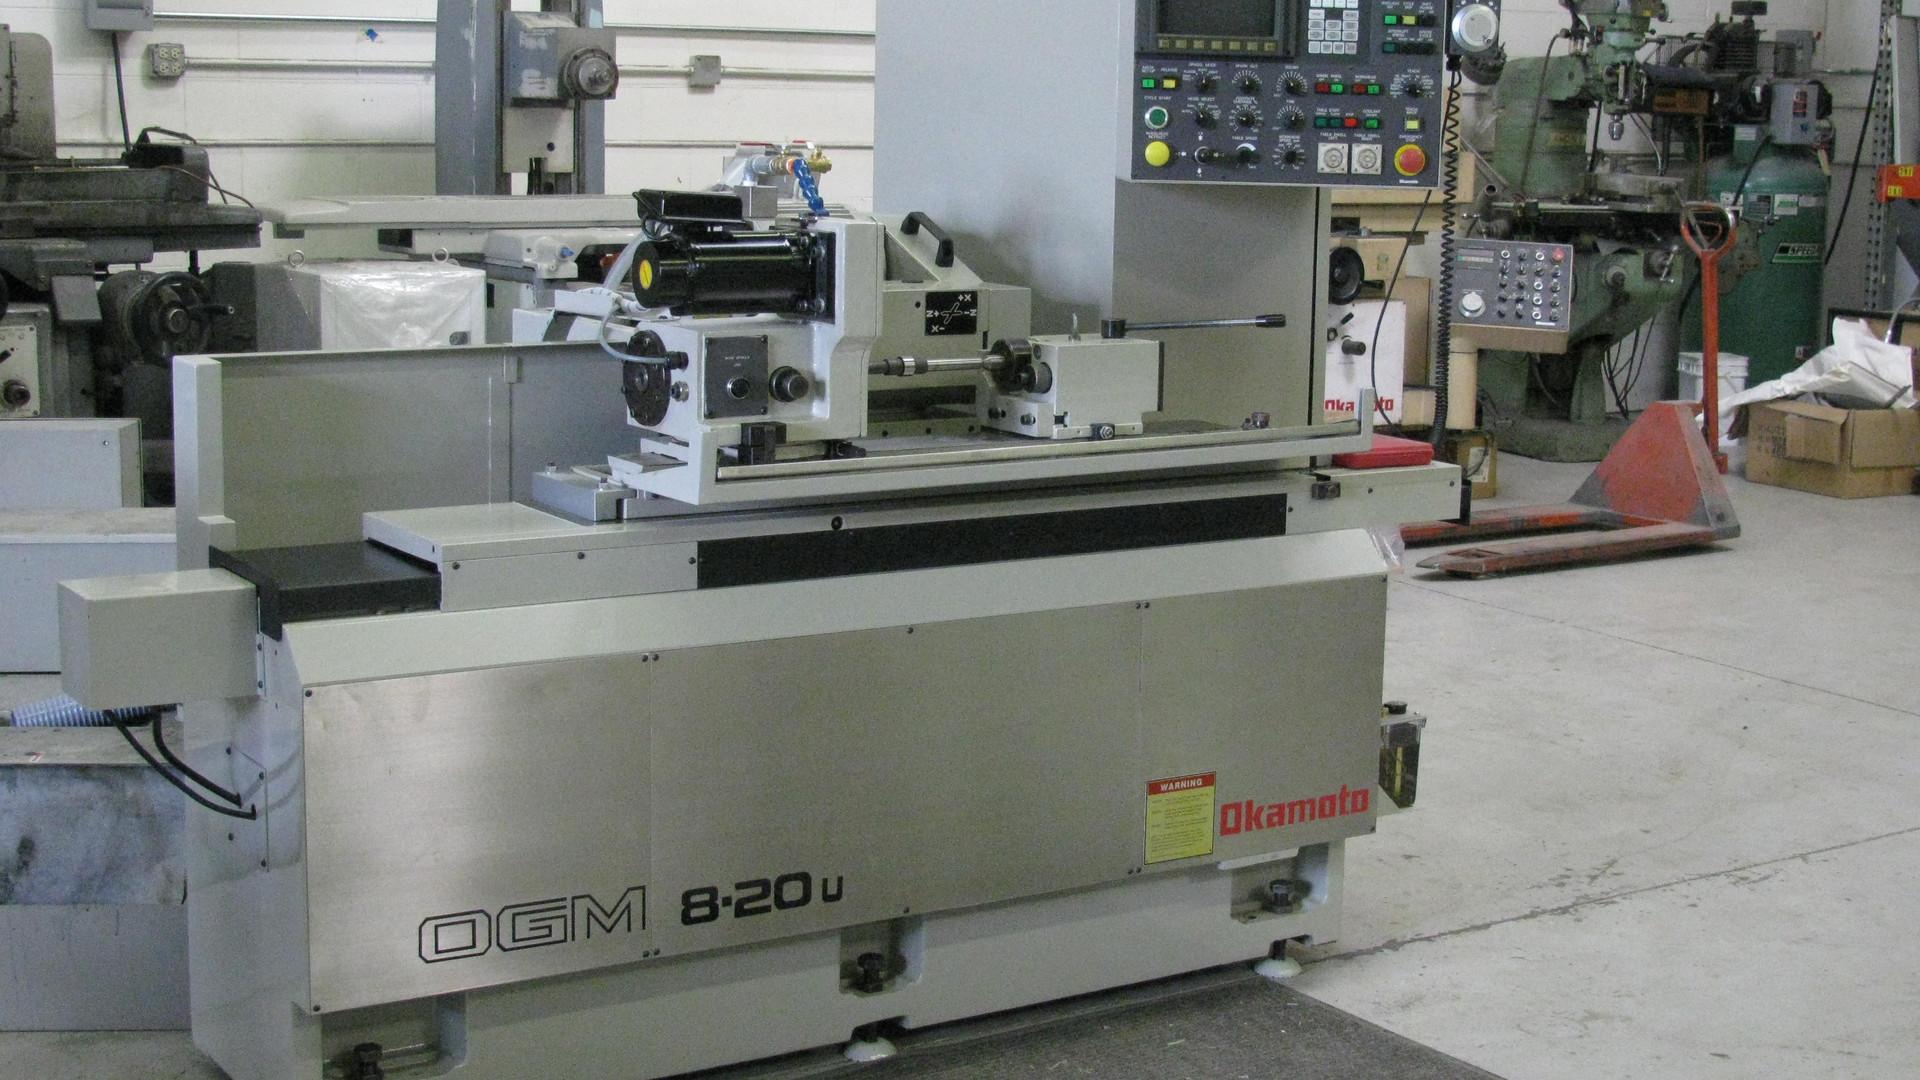 OKAMOTO OGM-820U Cylindrical Grinder